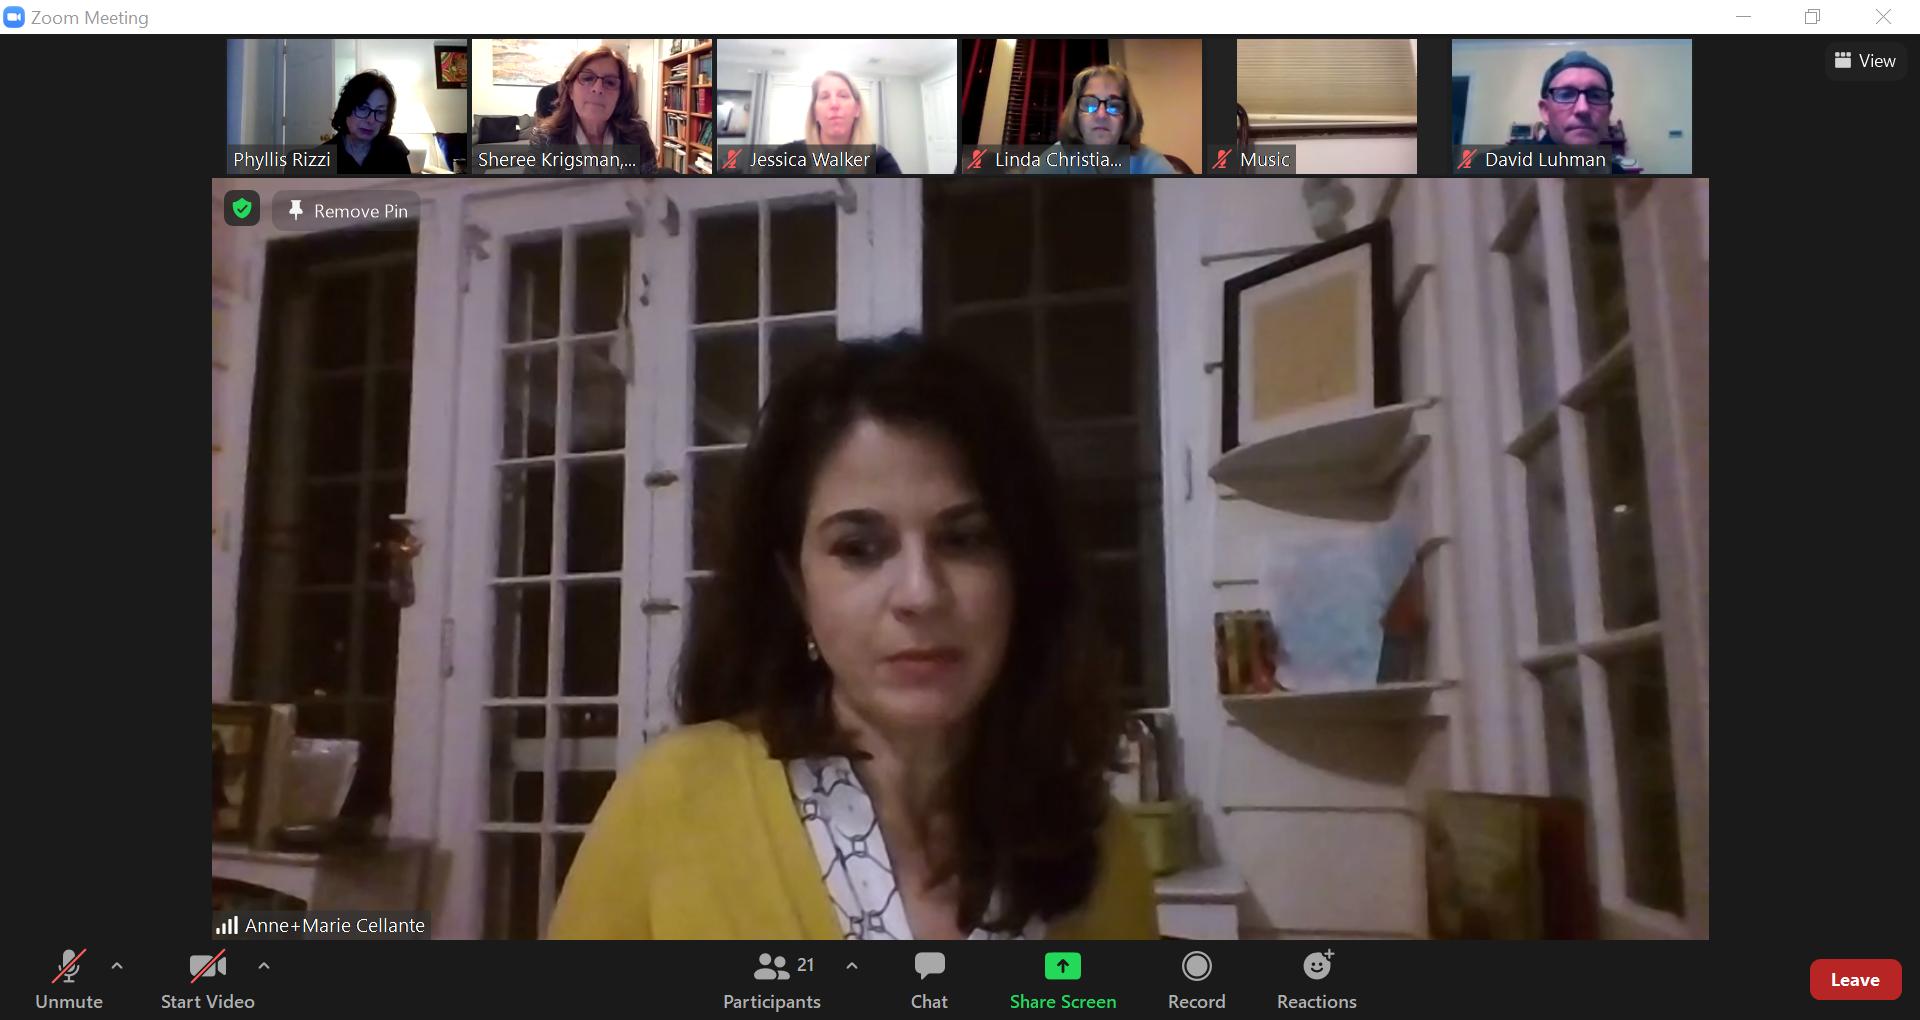 SEPTA executive board member Anne Marie Cellante addresses participants during the workshop.